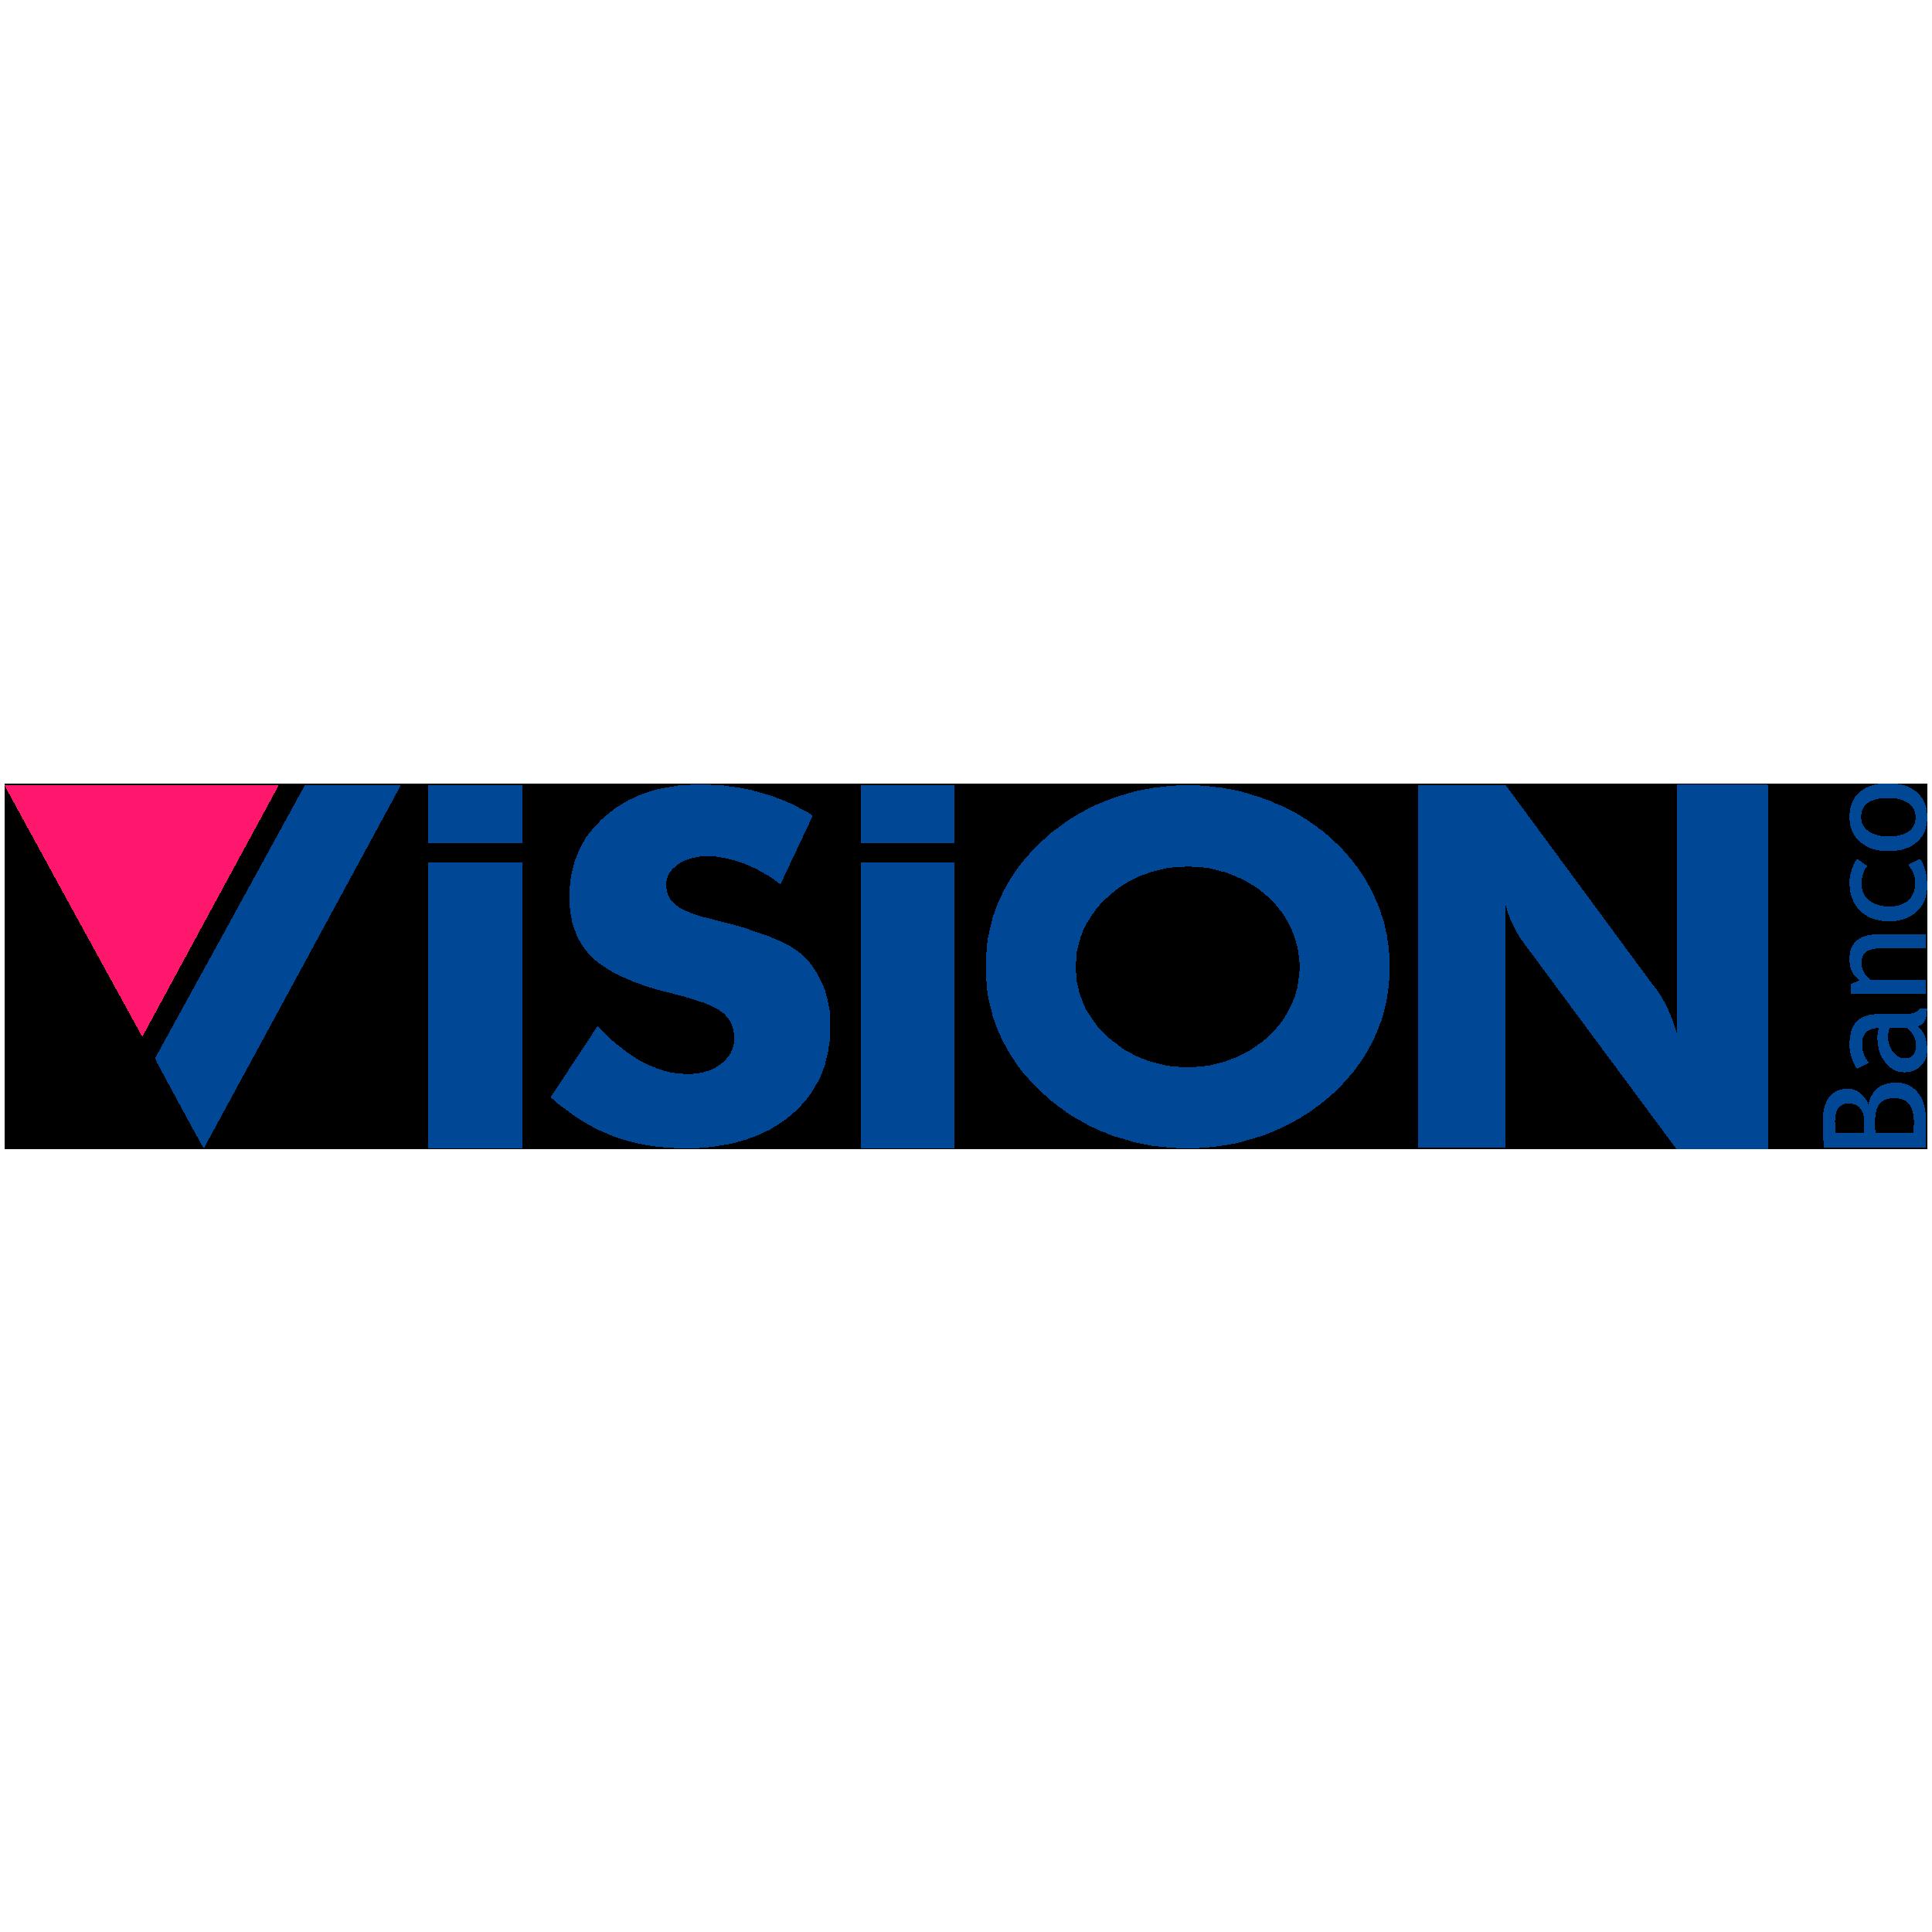 Vision Banco